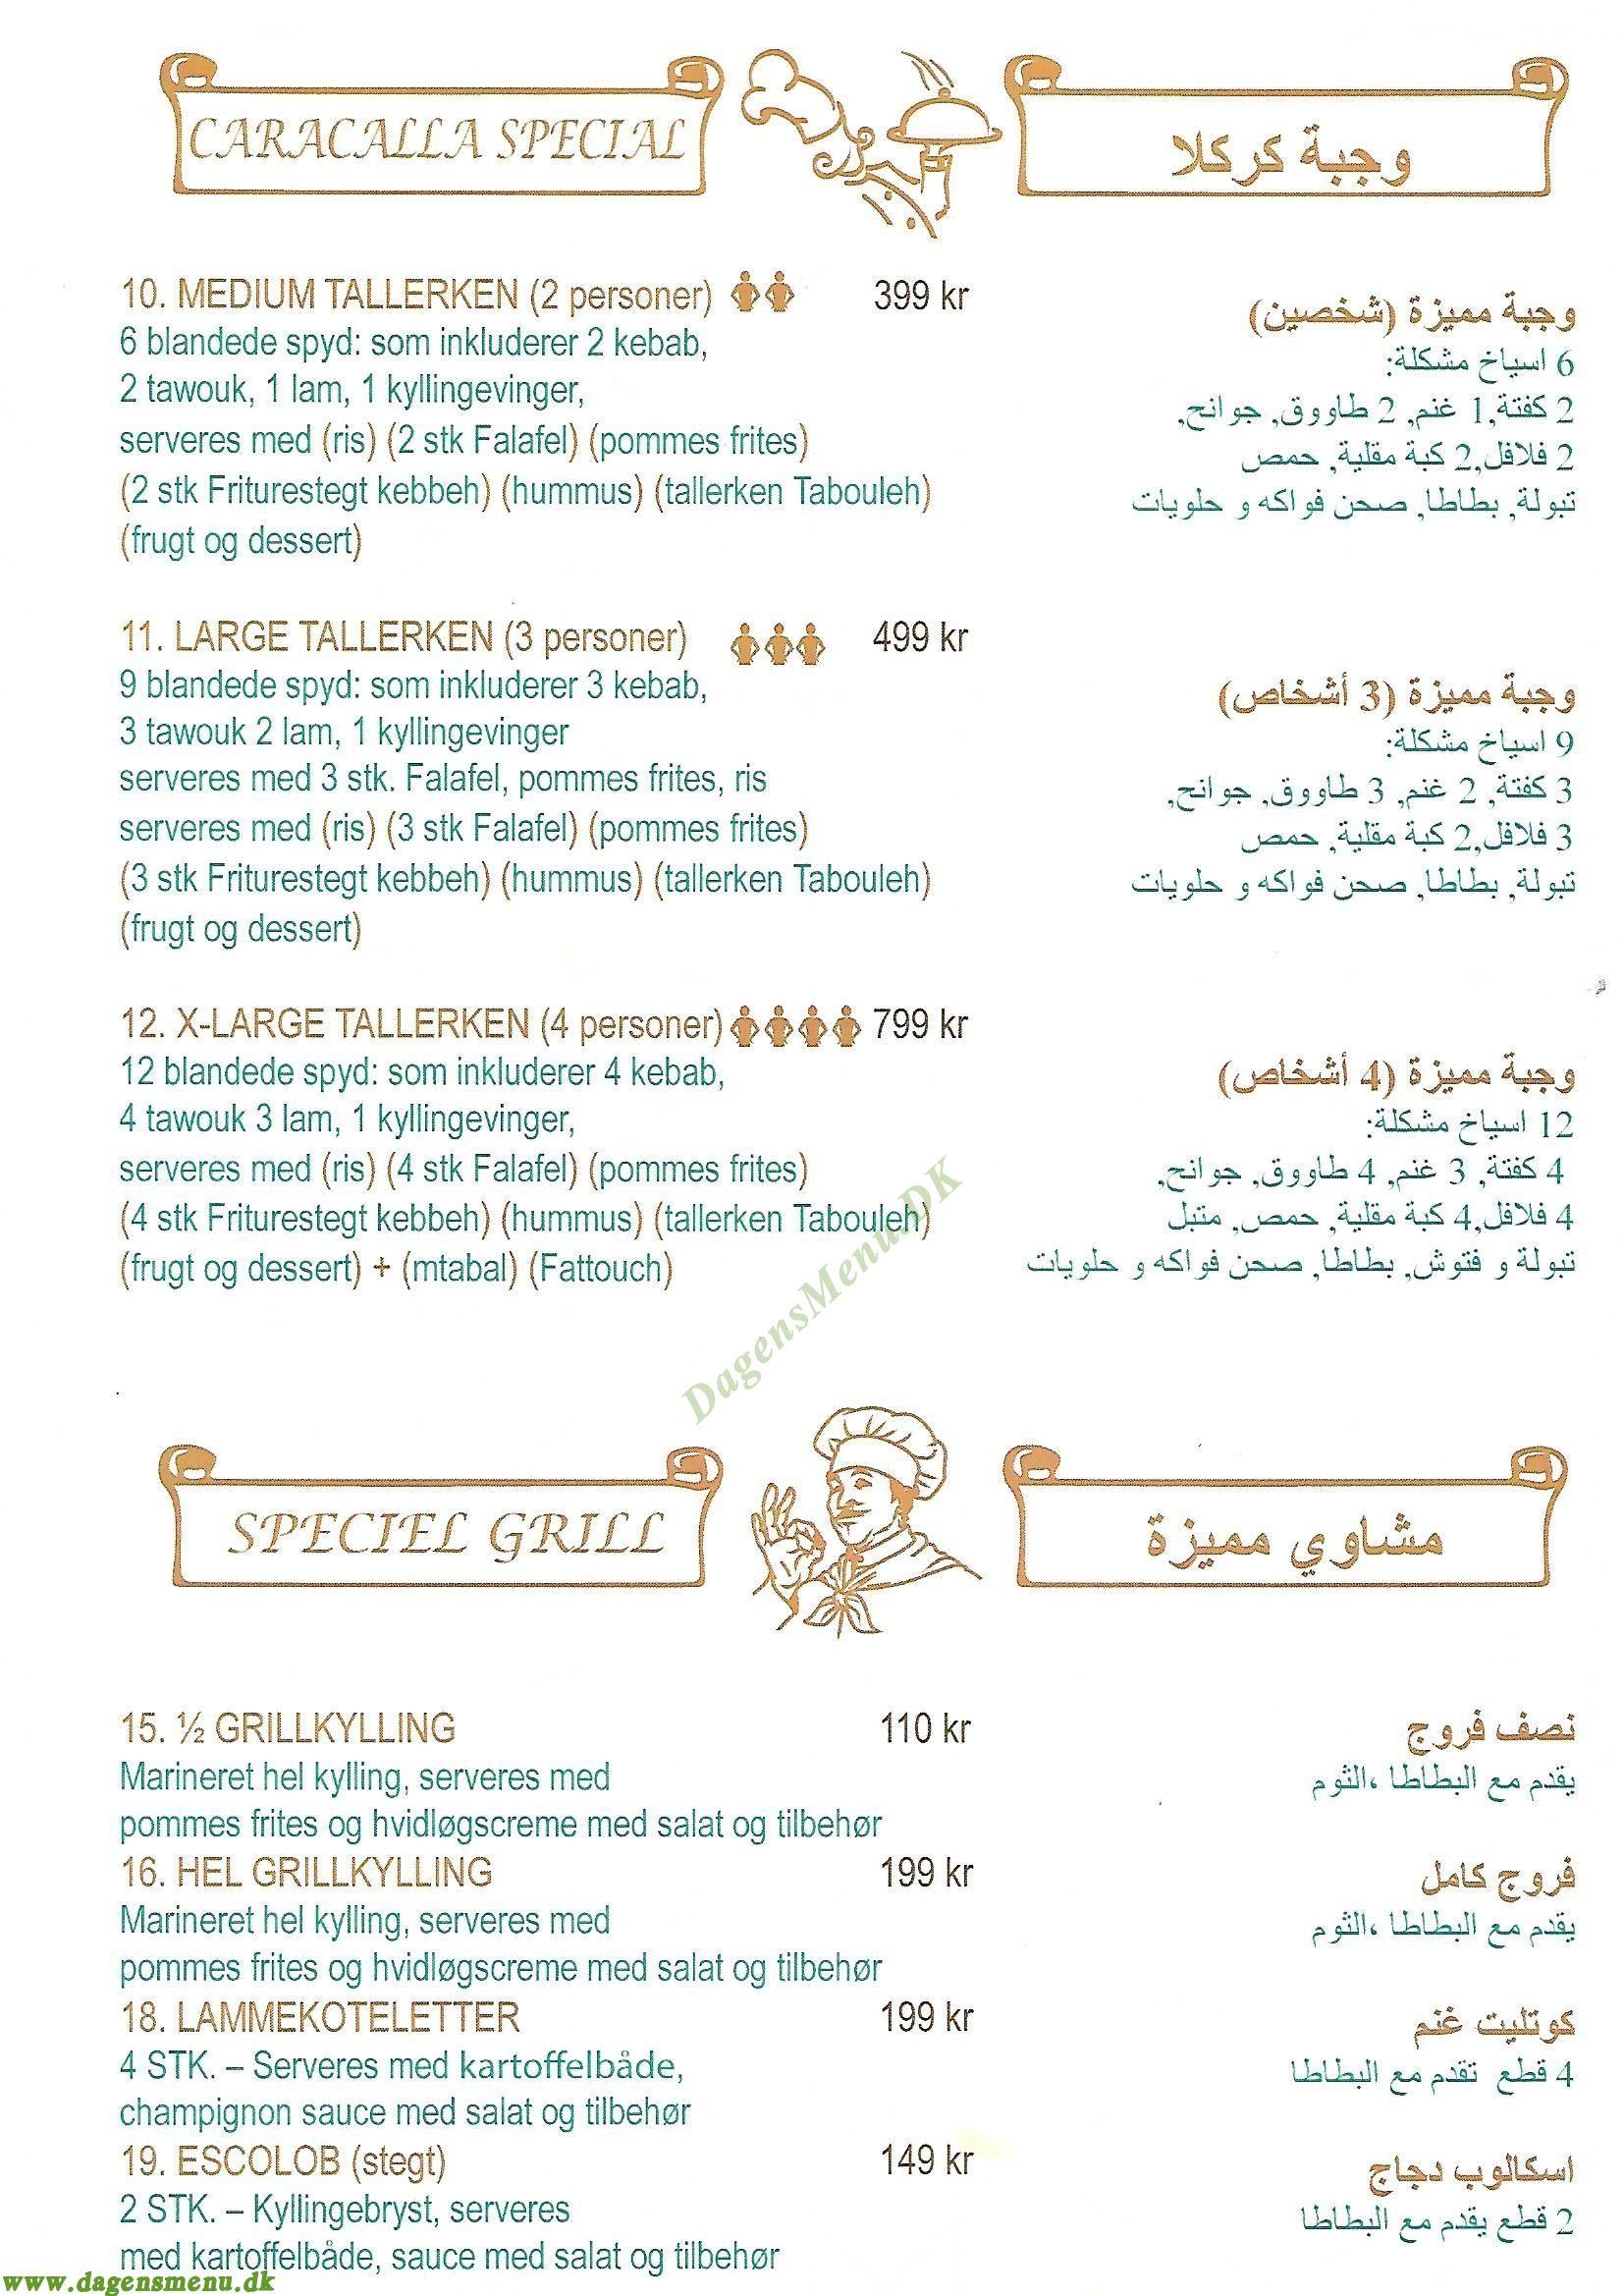 Caracalla  Restaurant - Menukort